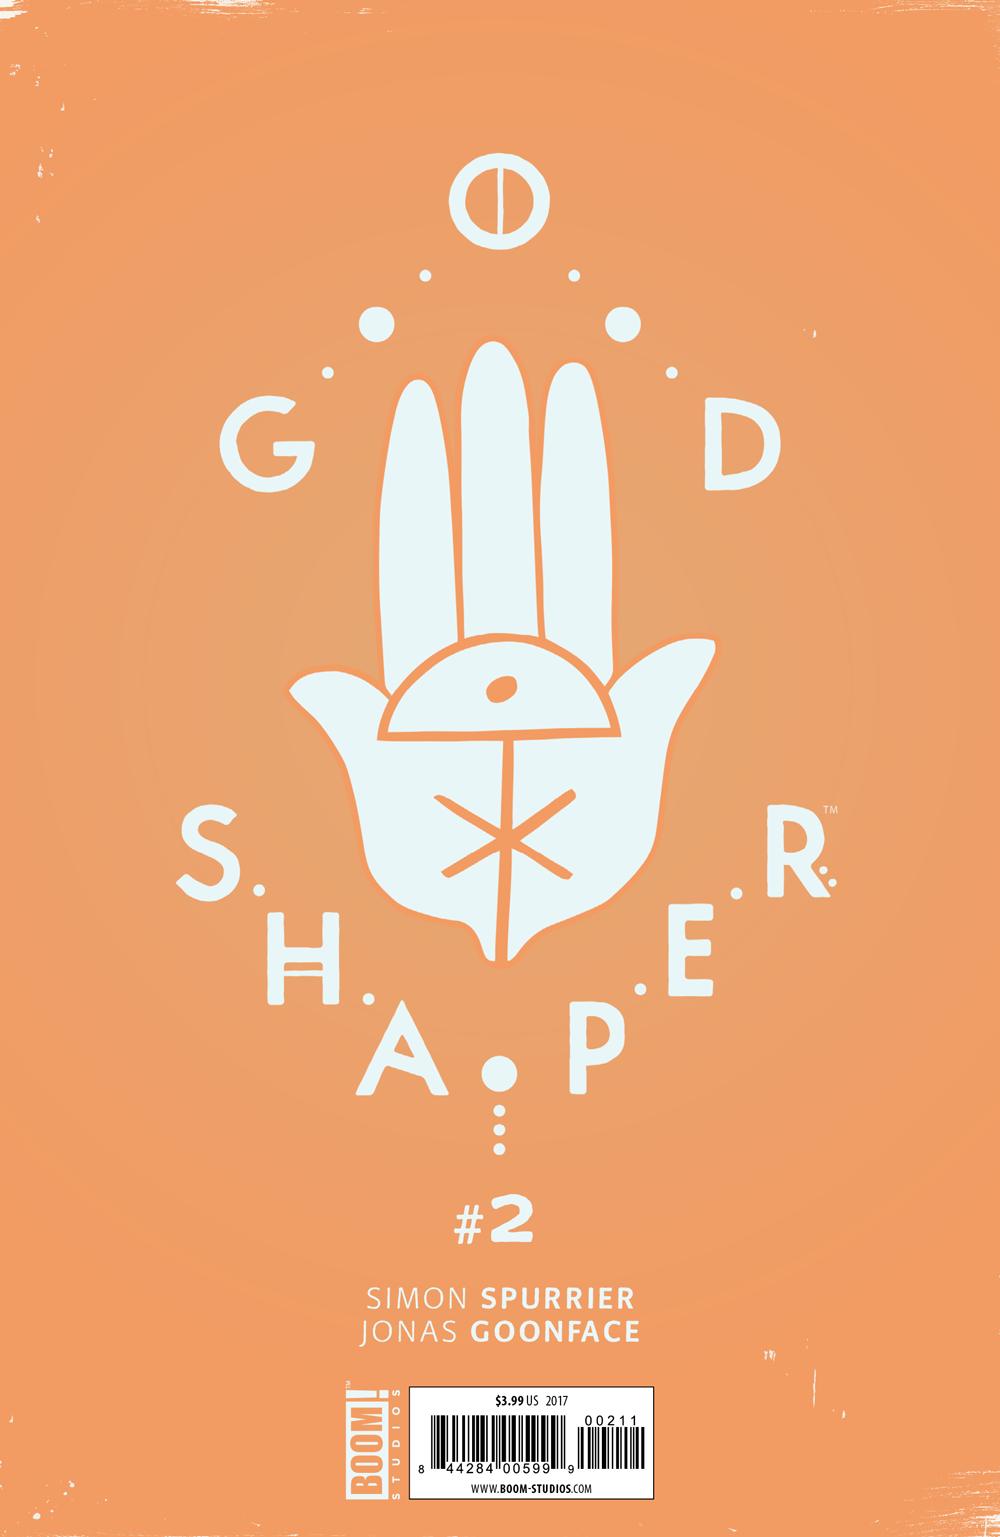 Godshaper_002_2.png